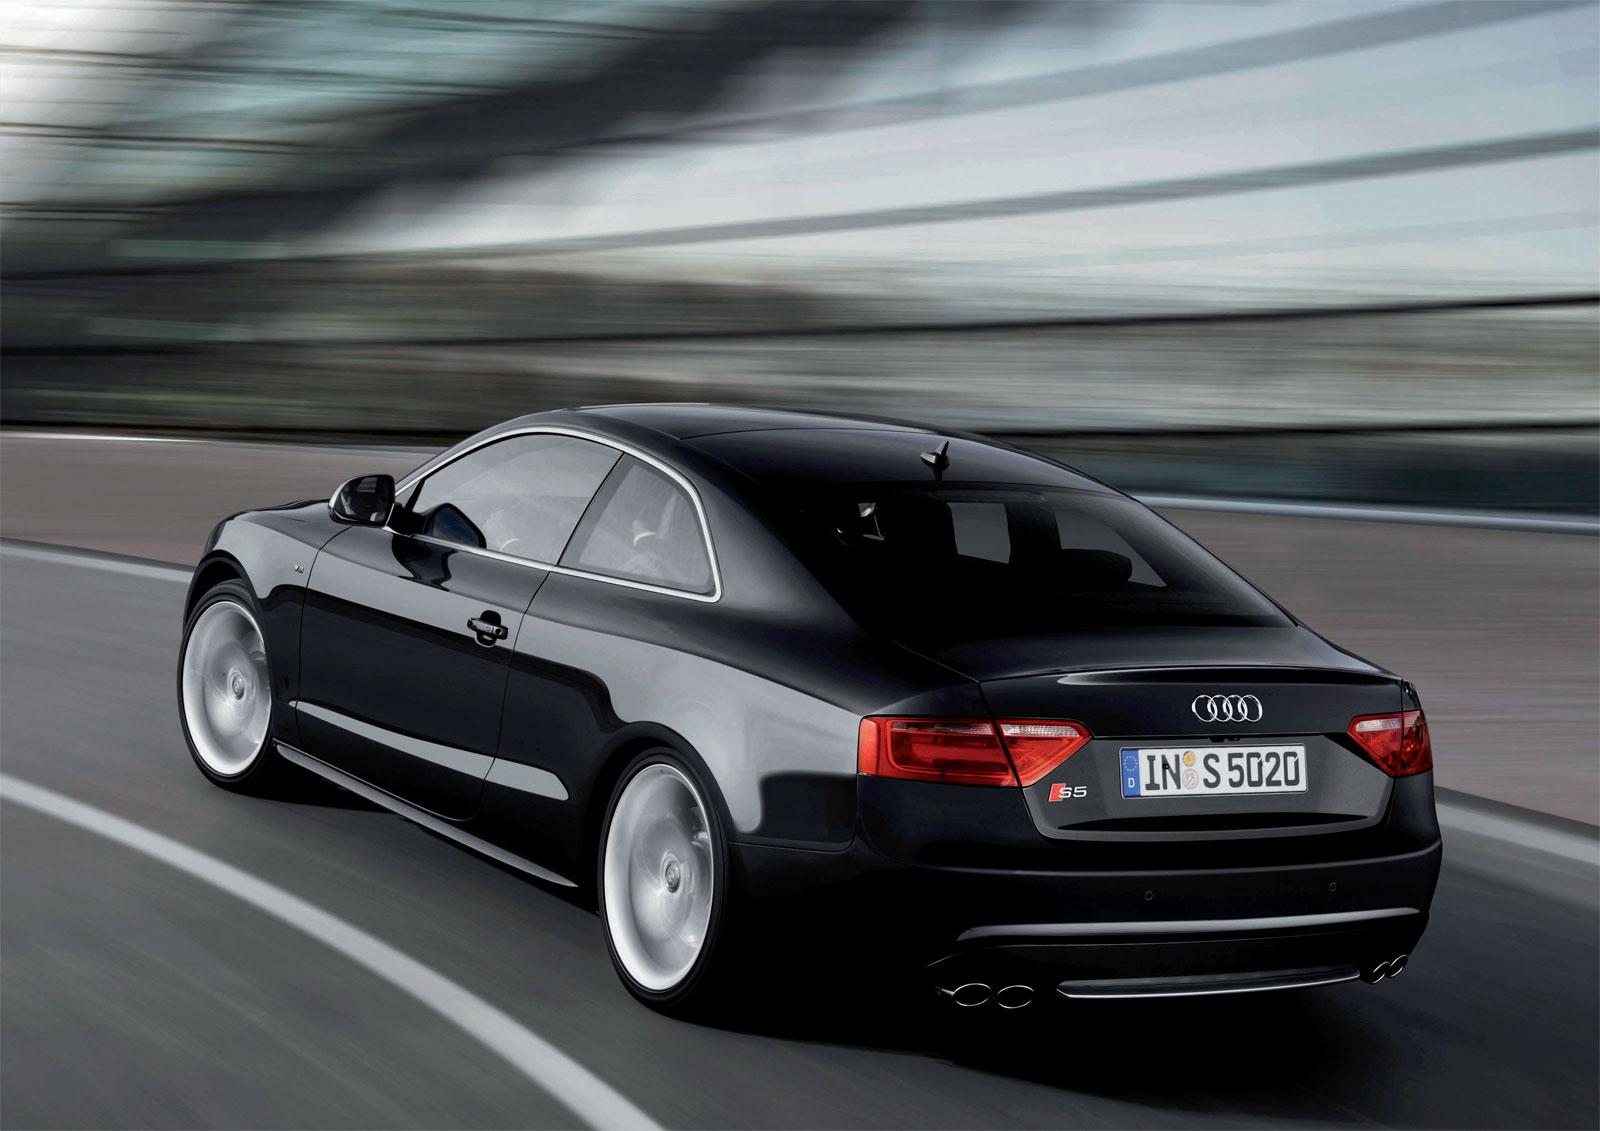 Audi S5 HD WallPaperS Best High Quality Car Desktop Wallpapers in HD 1600x1131